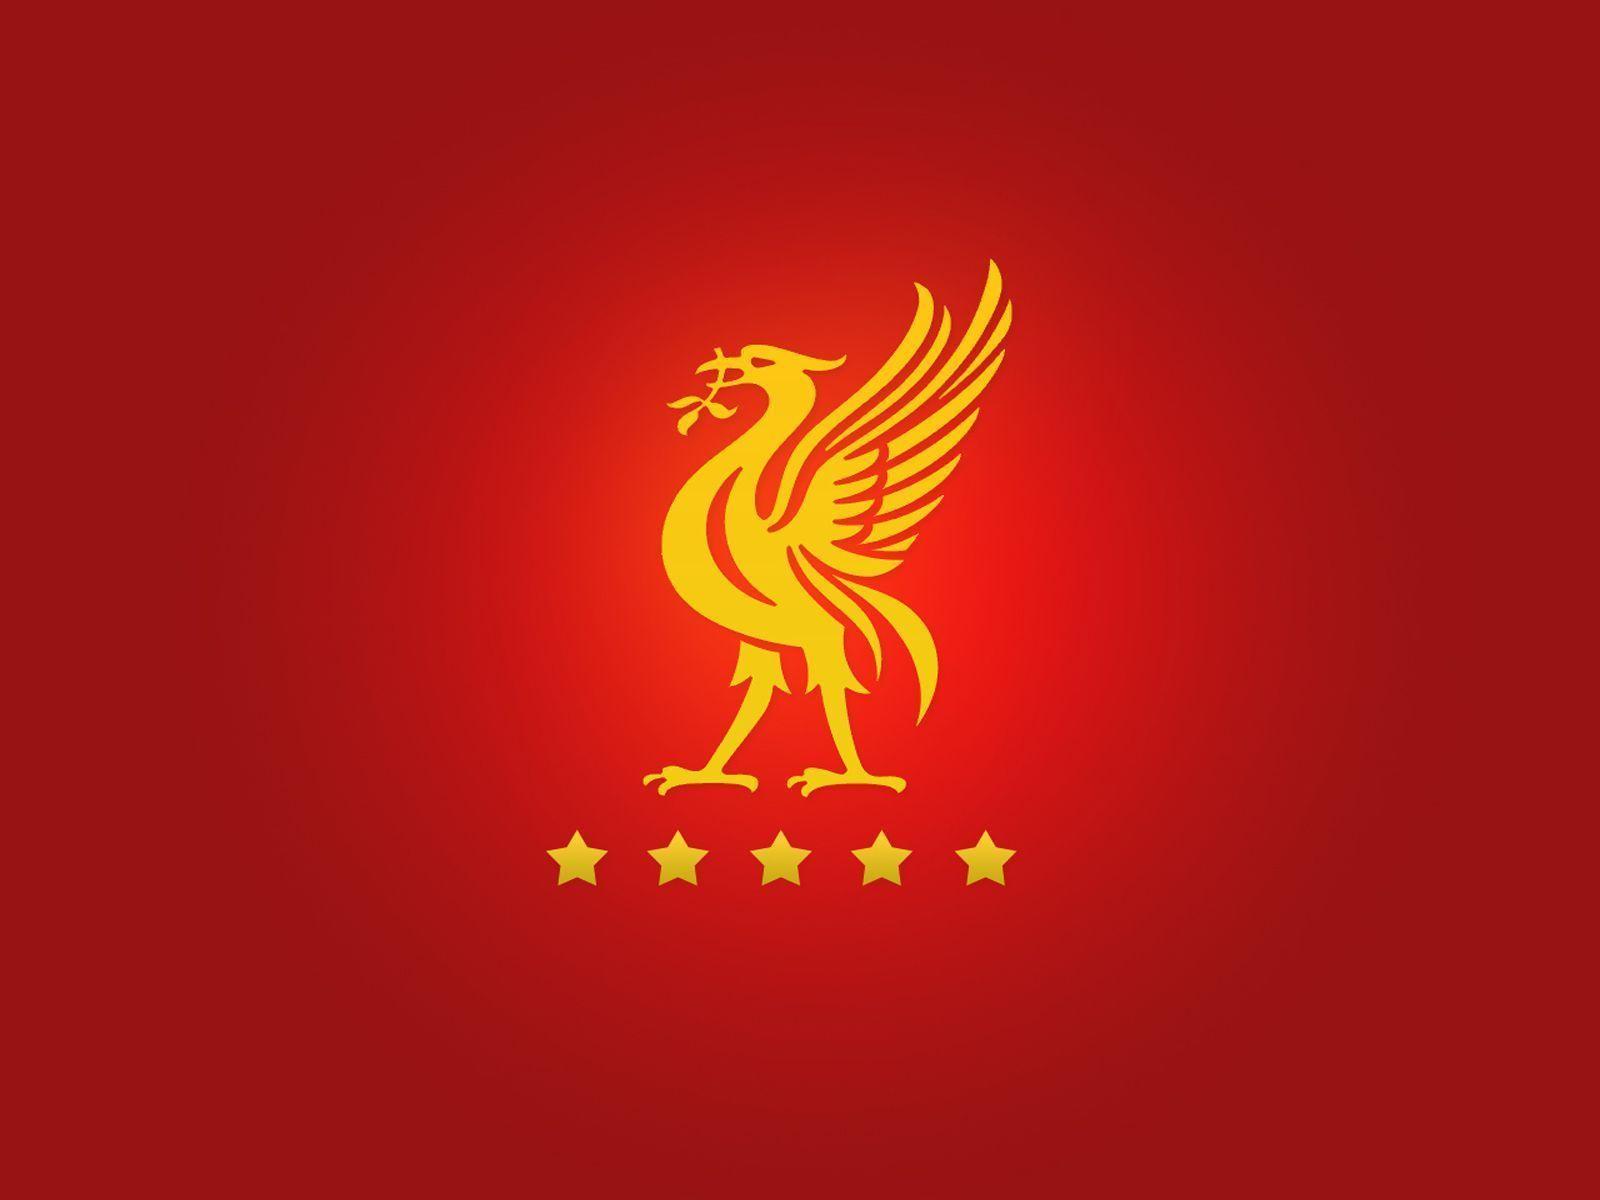 liverpool fc d logo wallpaper football wallpapers hd hd liverpool rh pinterest com